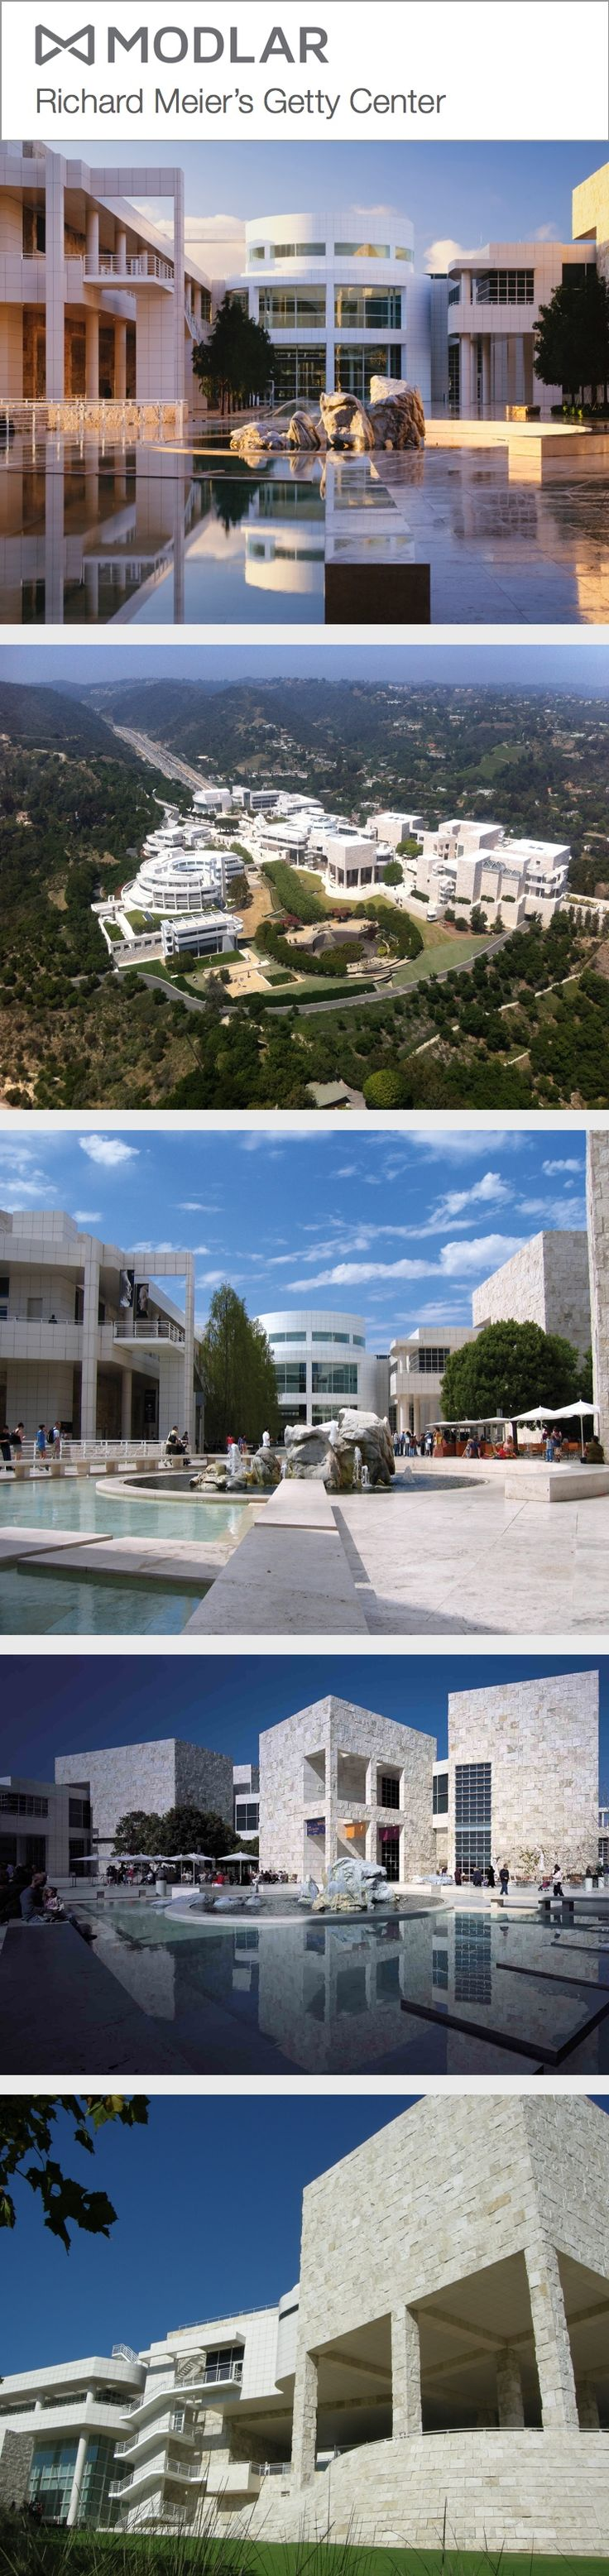 Richard Meier's Getty Center, LA, USA #Meier #Architecture modlar.com